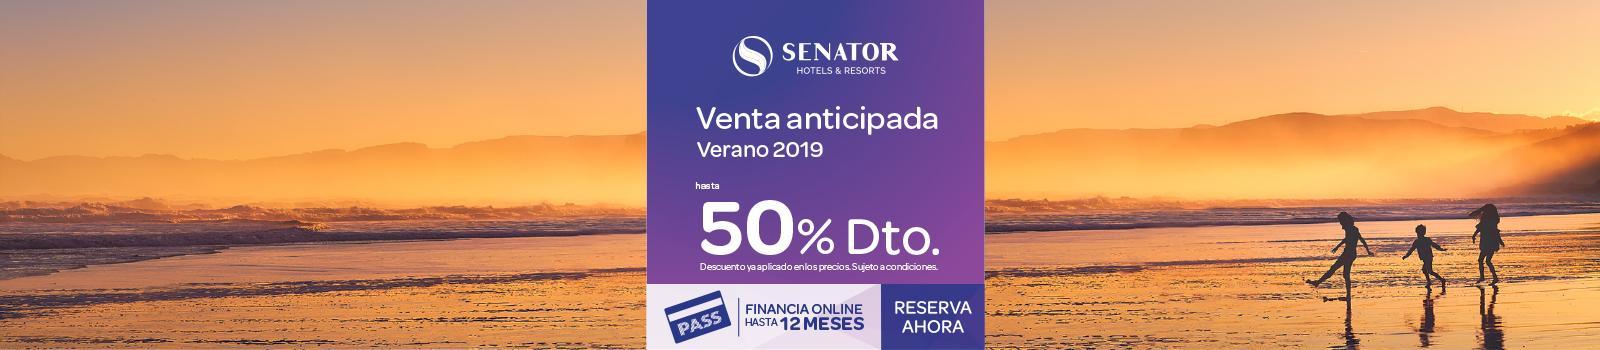 Oferta Venta Anticipada Verano Hoteles Playa Senator